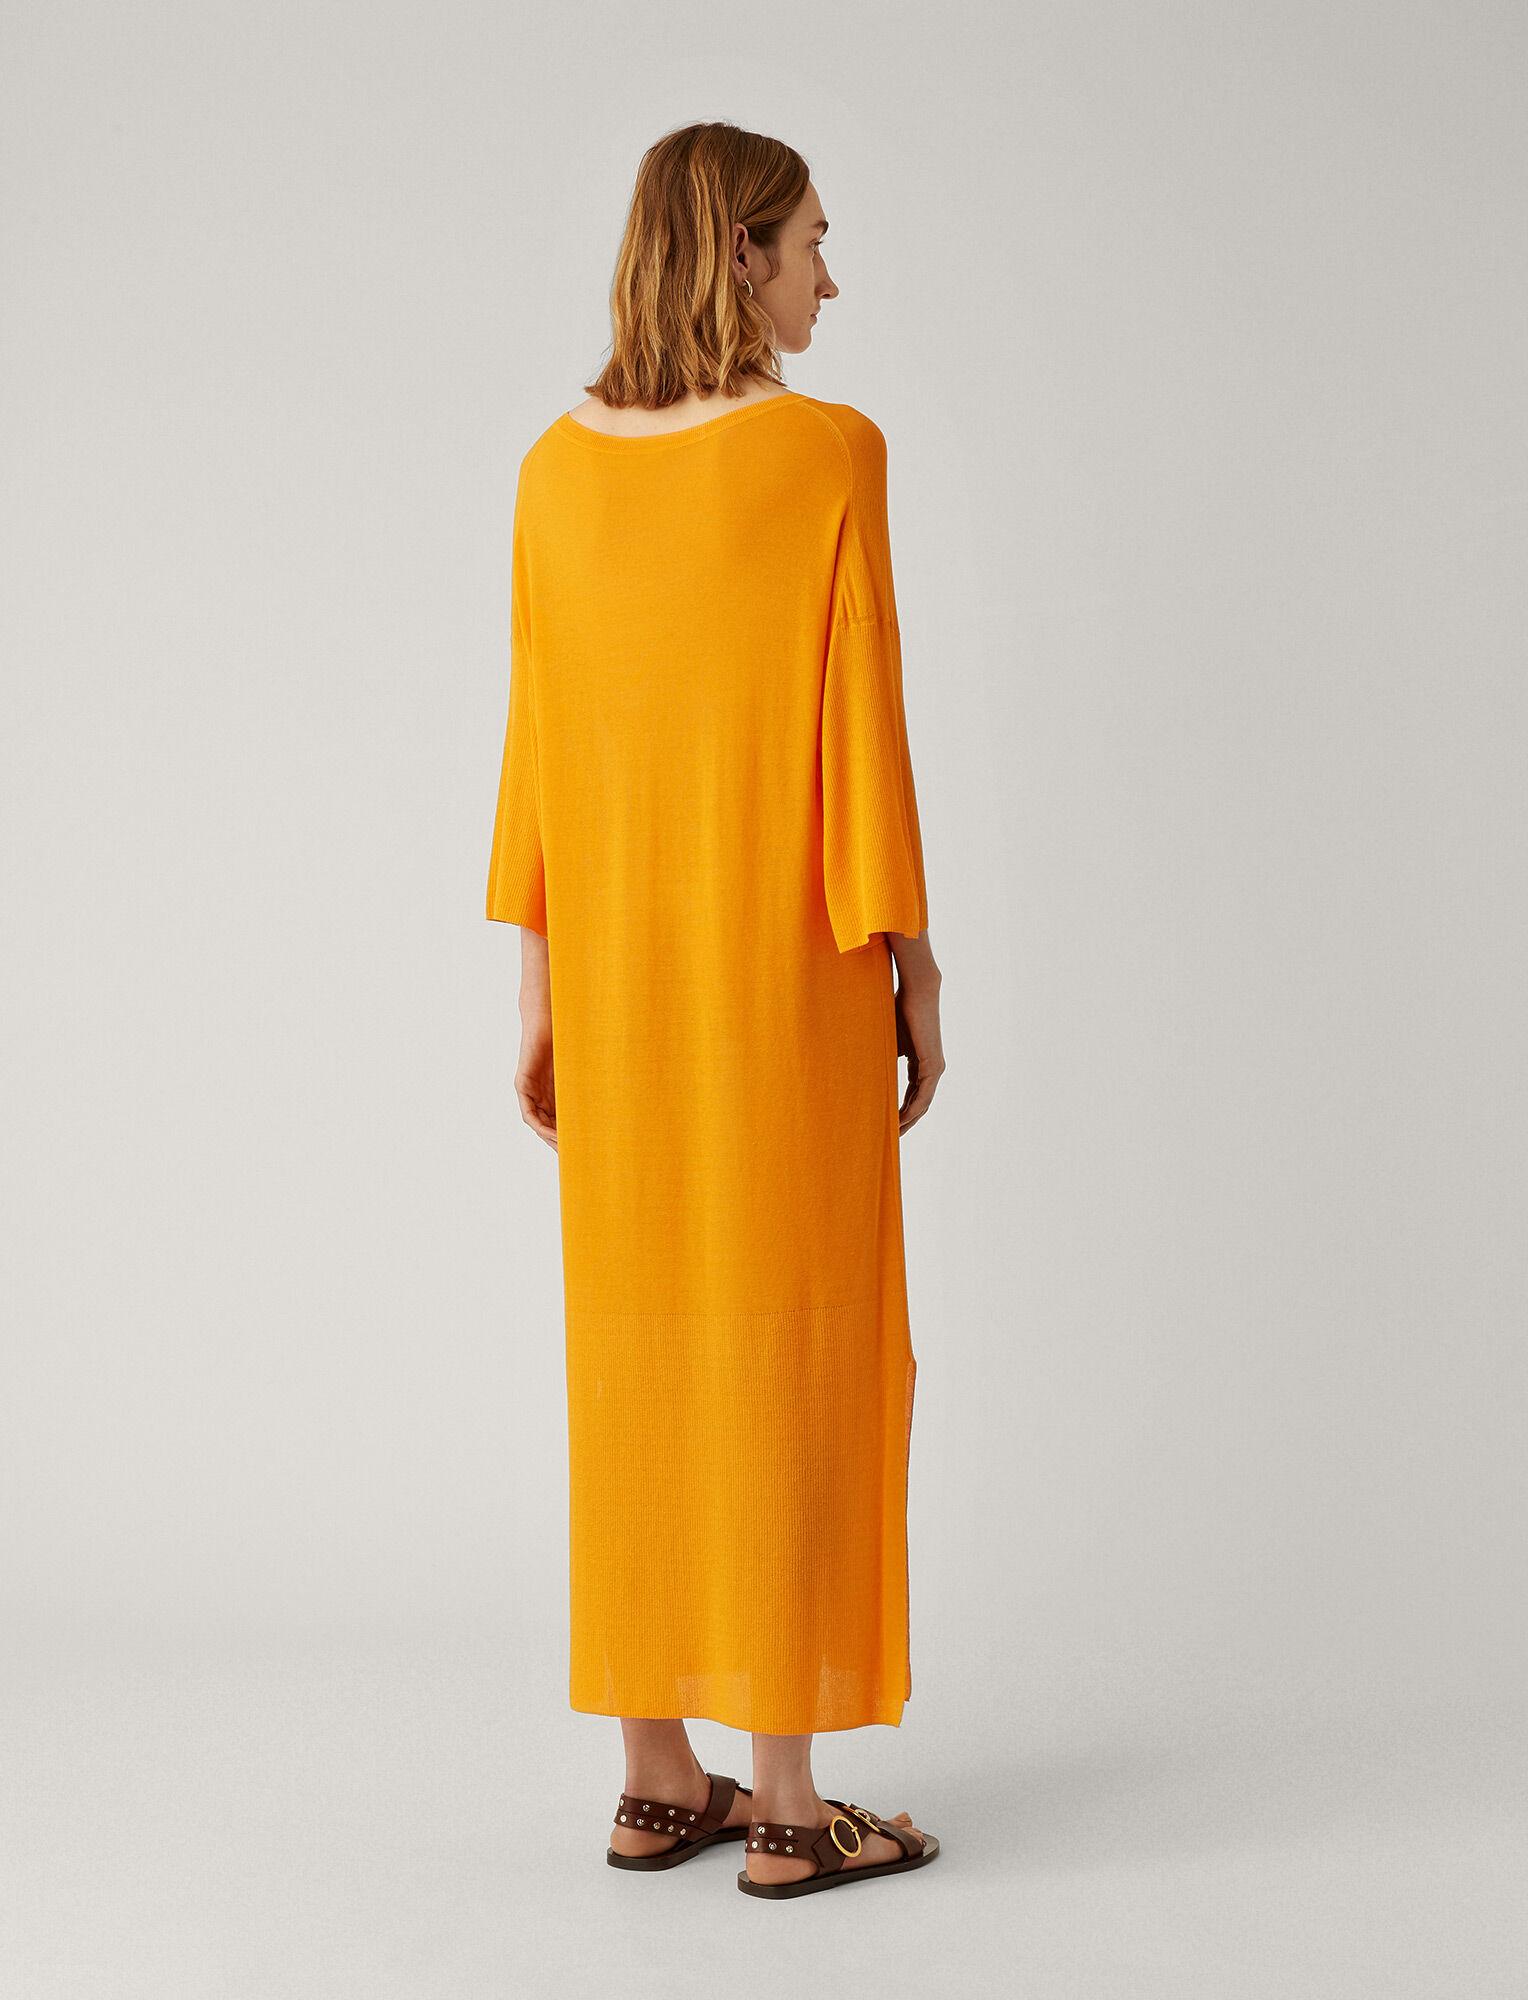 Joseph, Darline Sheer Cotton Dress, in TANGERINE